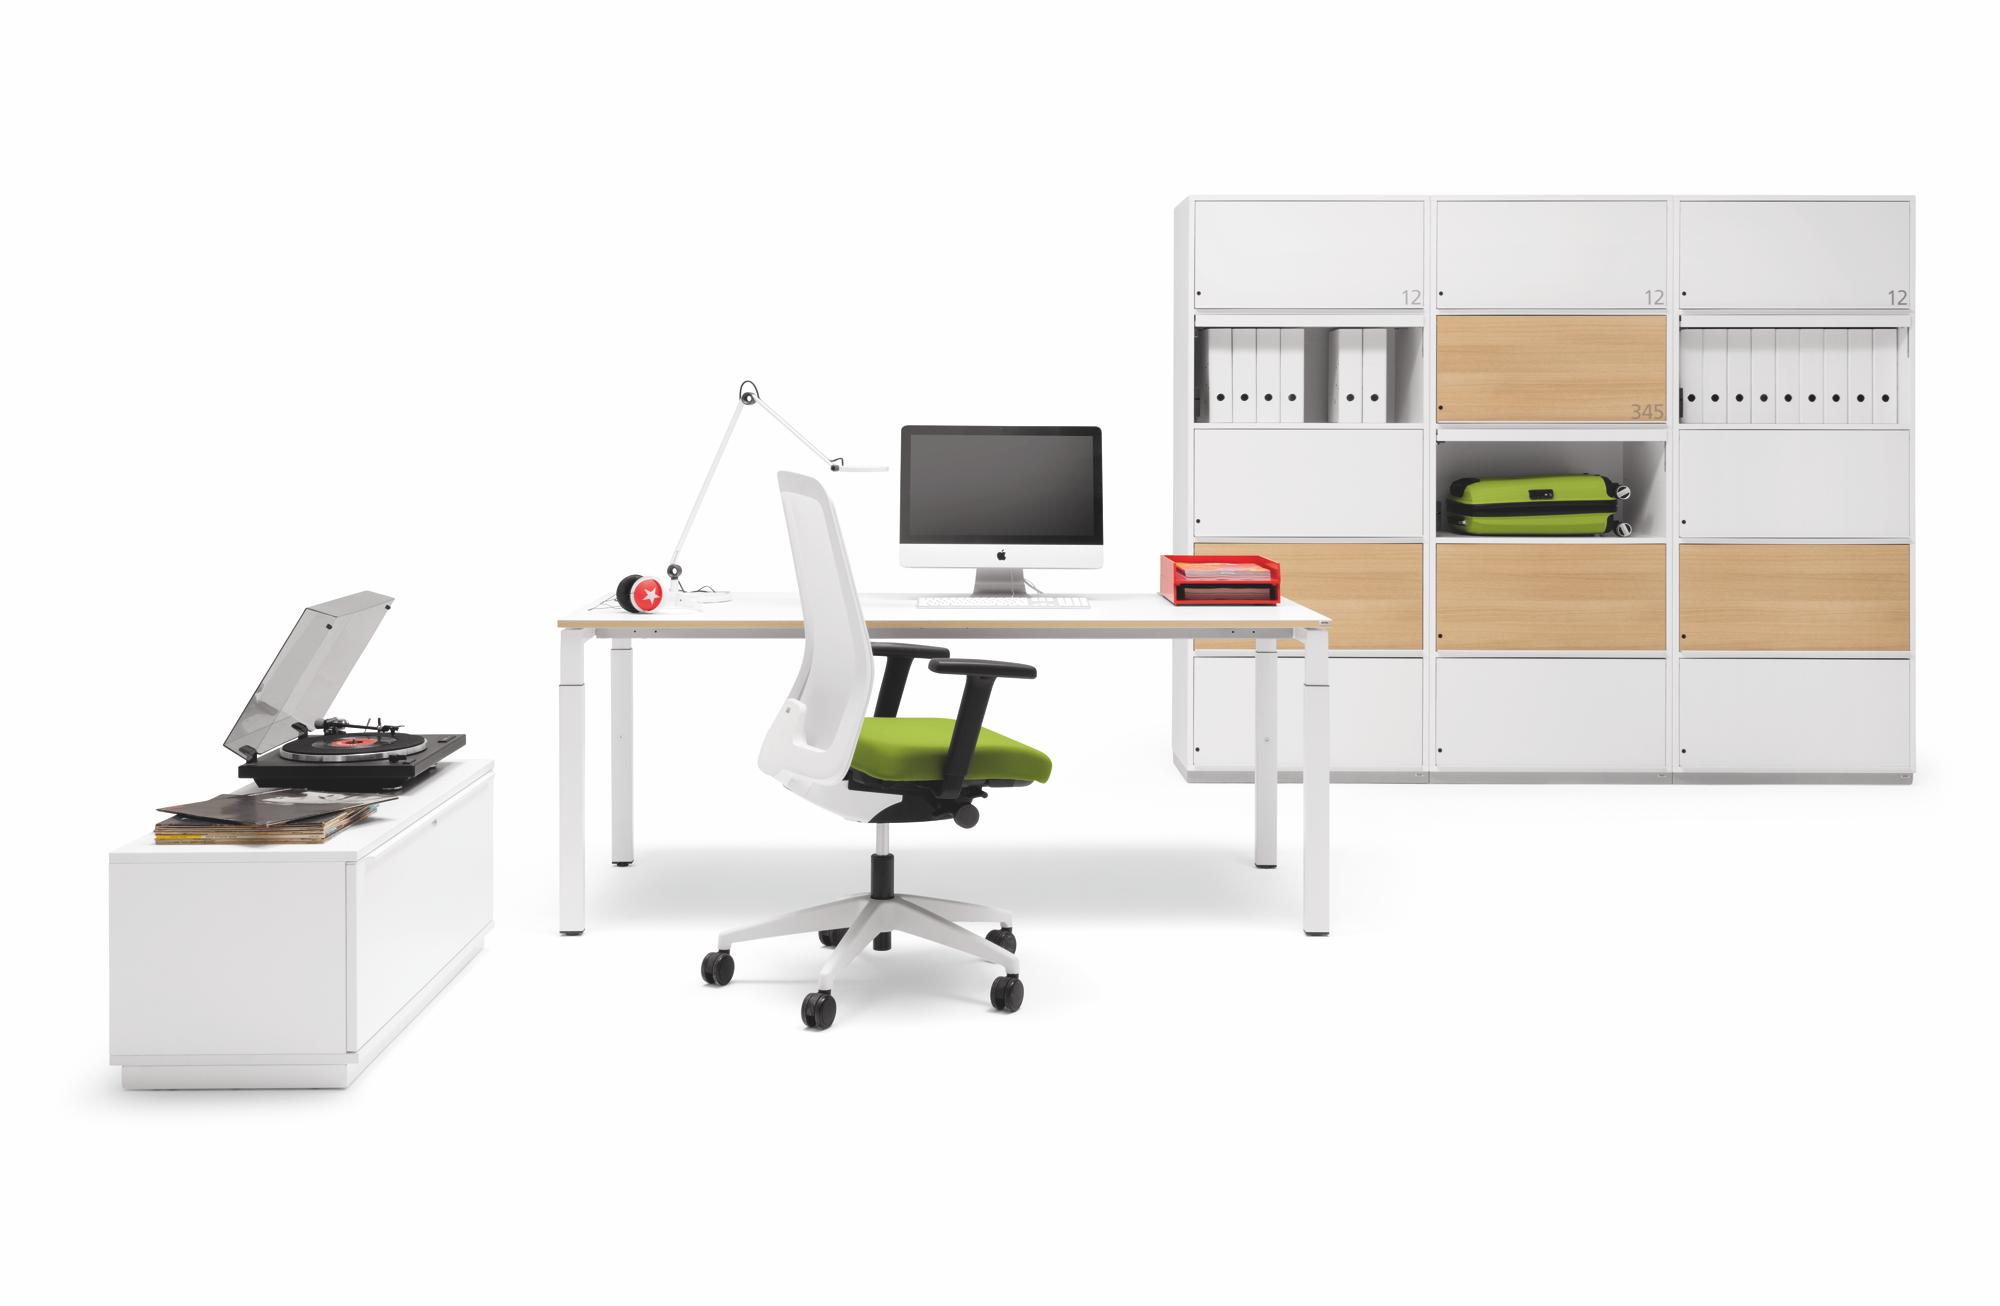 Firmenprofil Der Wini Büromöbel Bei Konradin Architektur